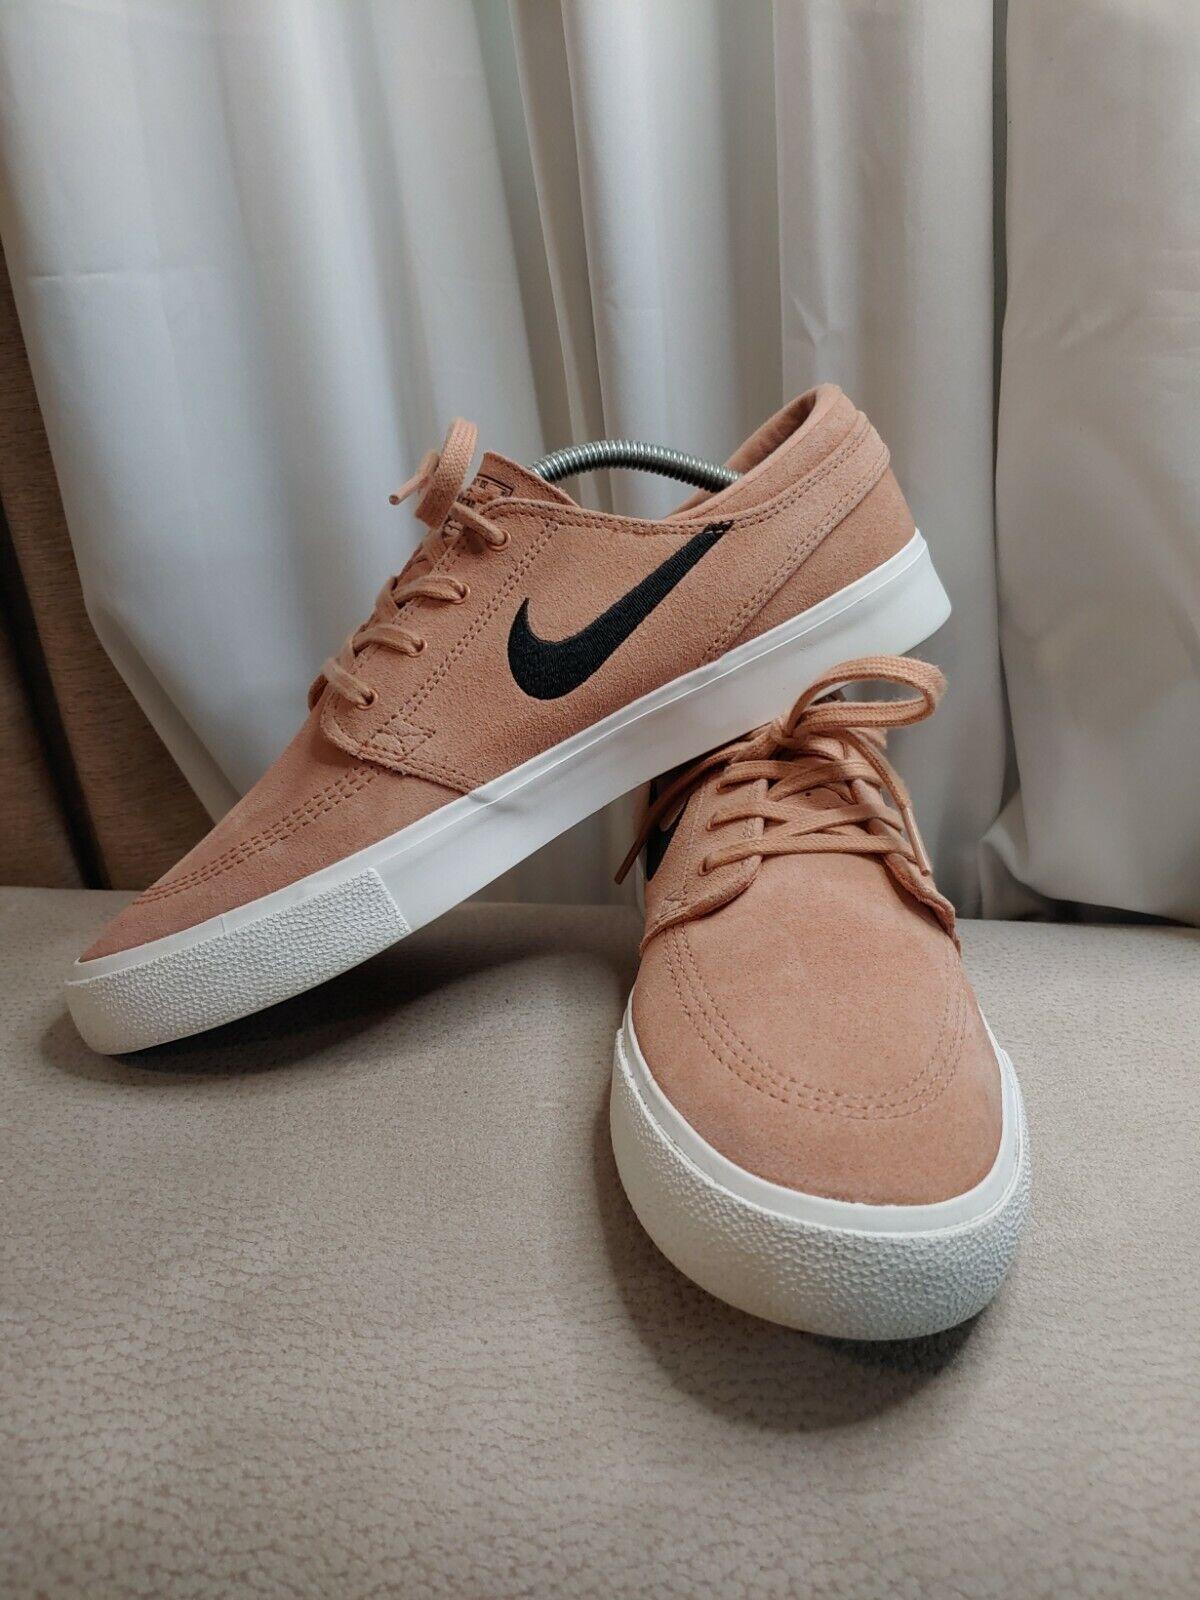 Size 10.5 - Nike Sb Zoom Stefan Janoski RM Rose Gold for sale ...